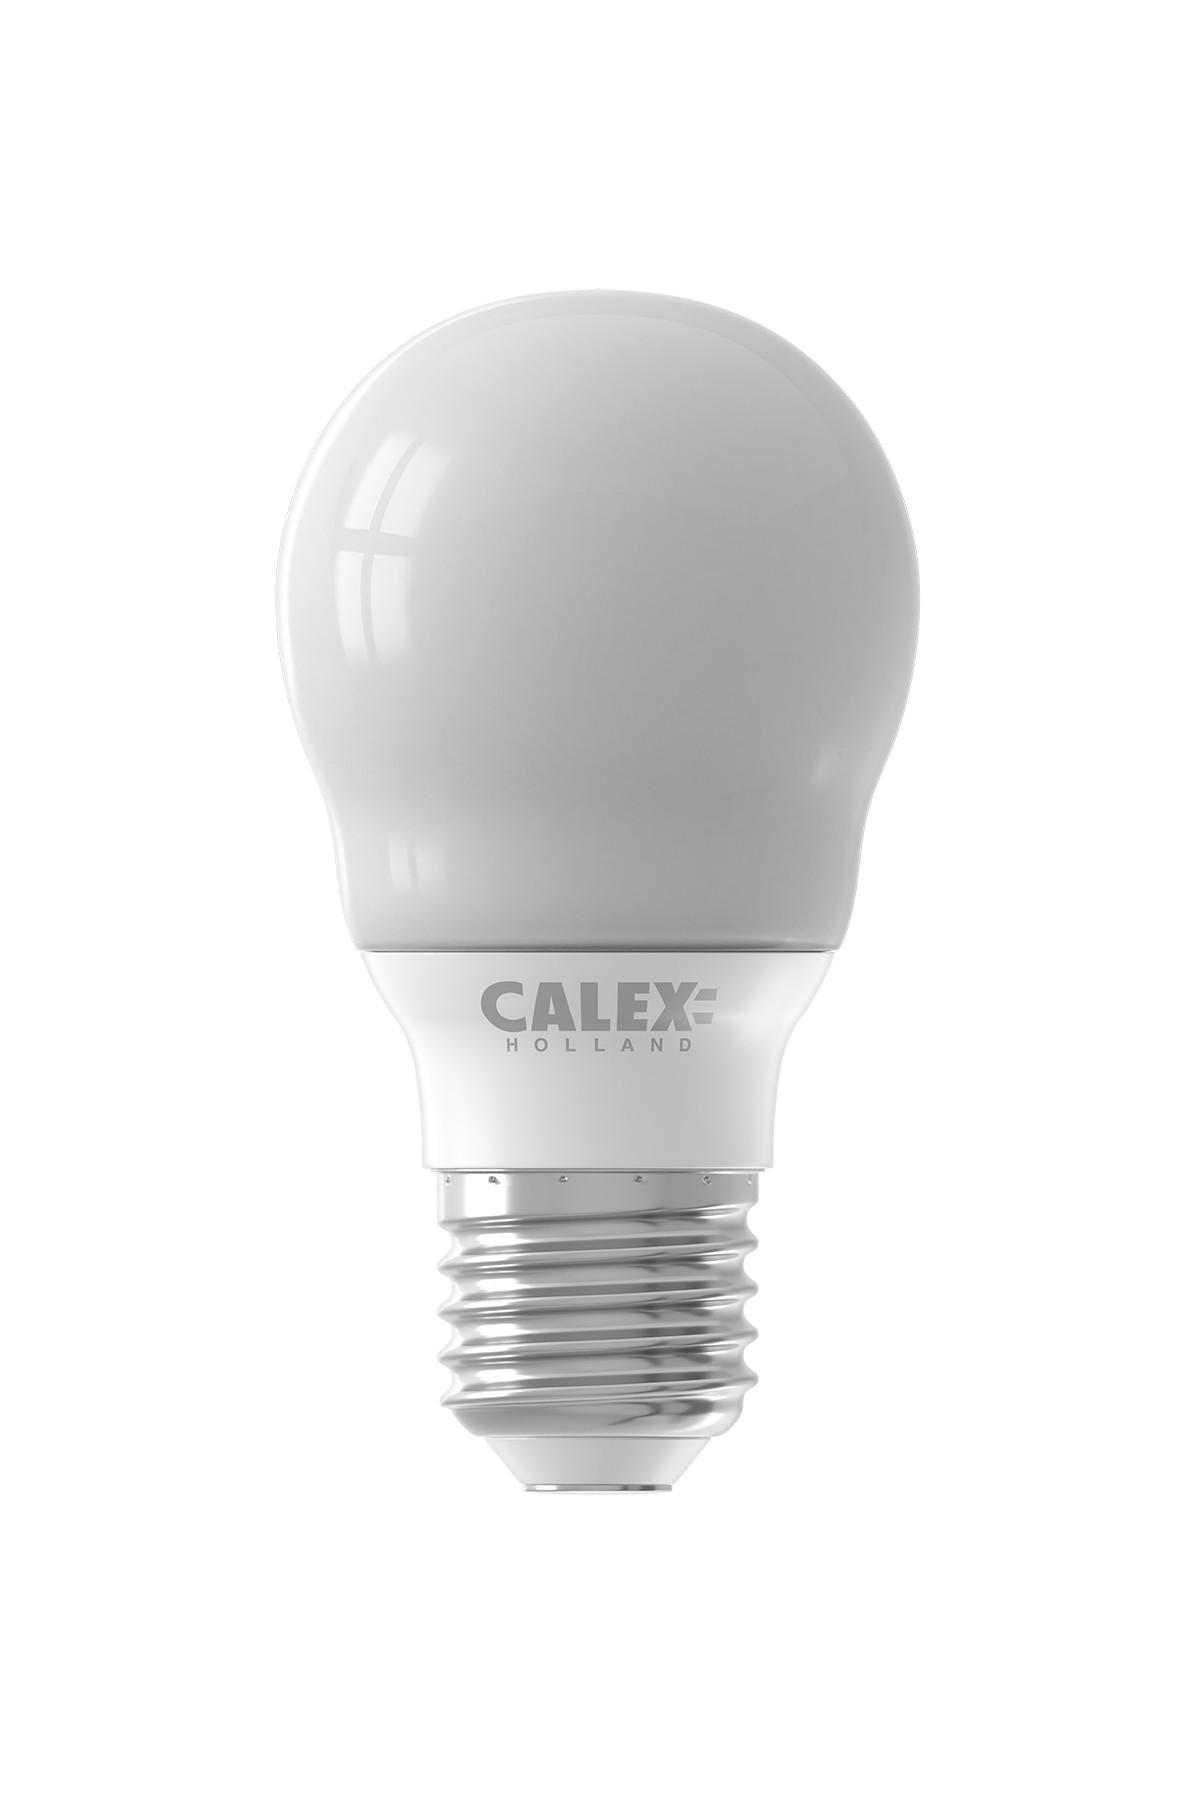 LED standaardlamp 240V 3,4W